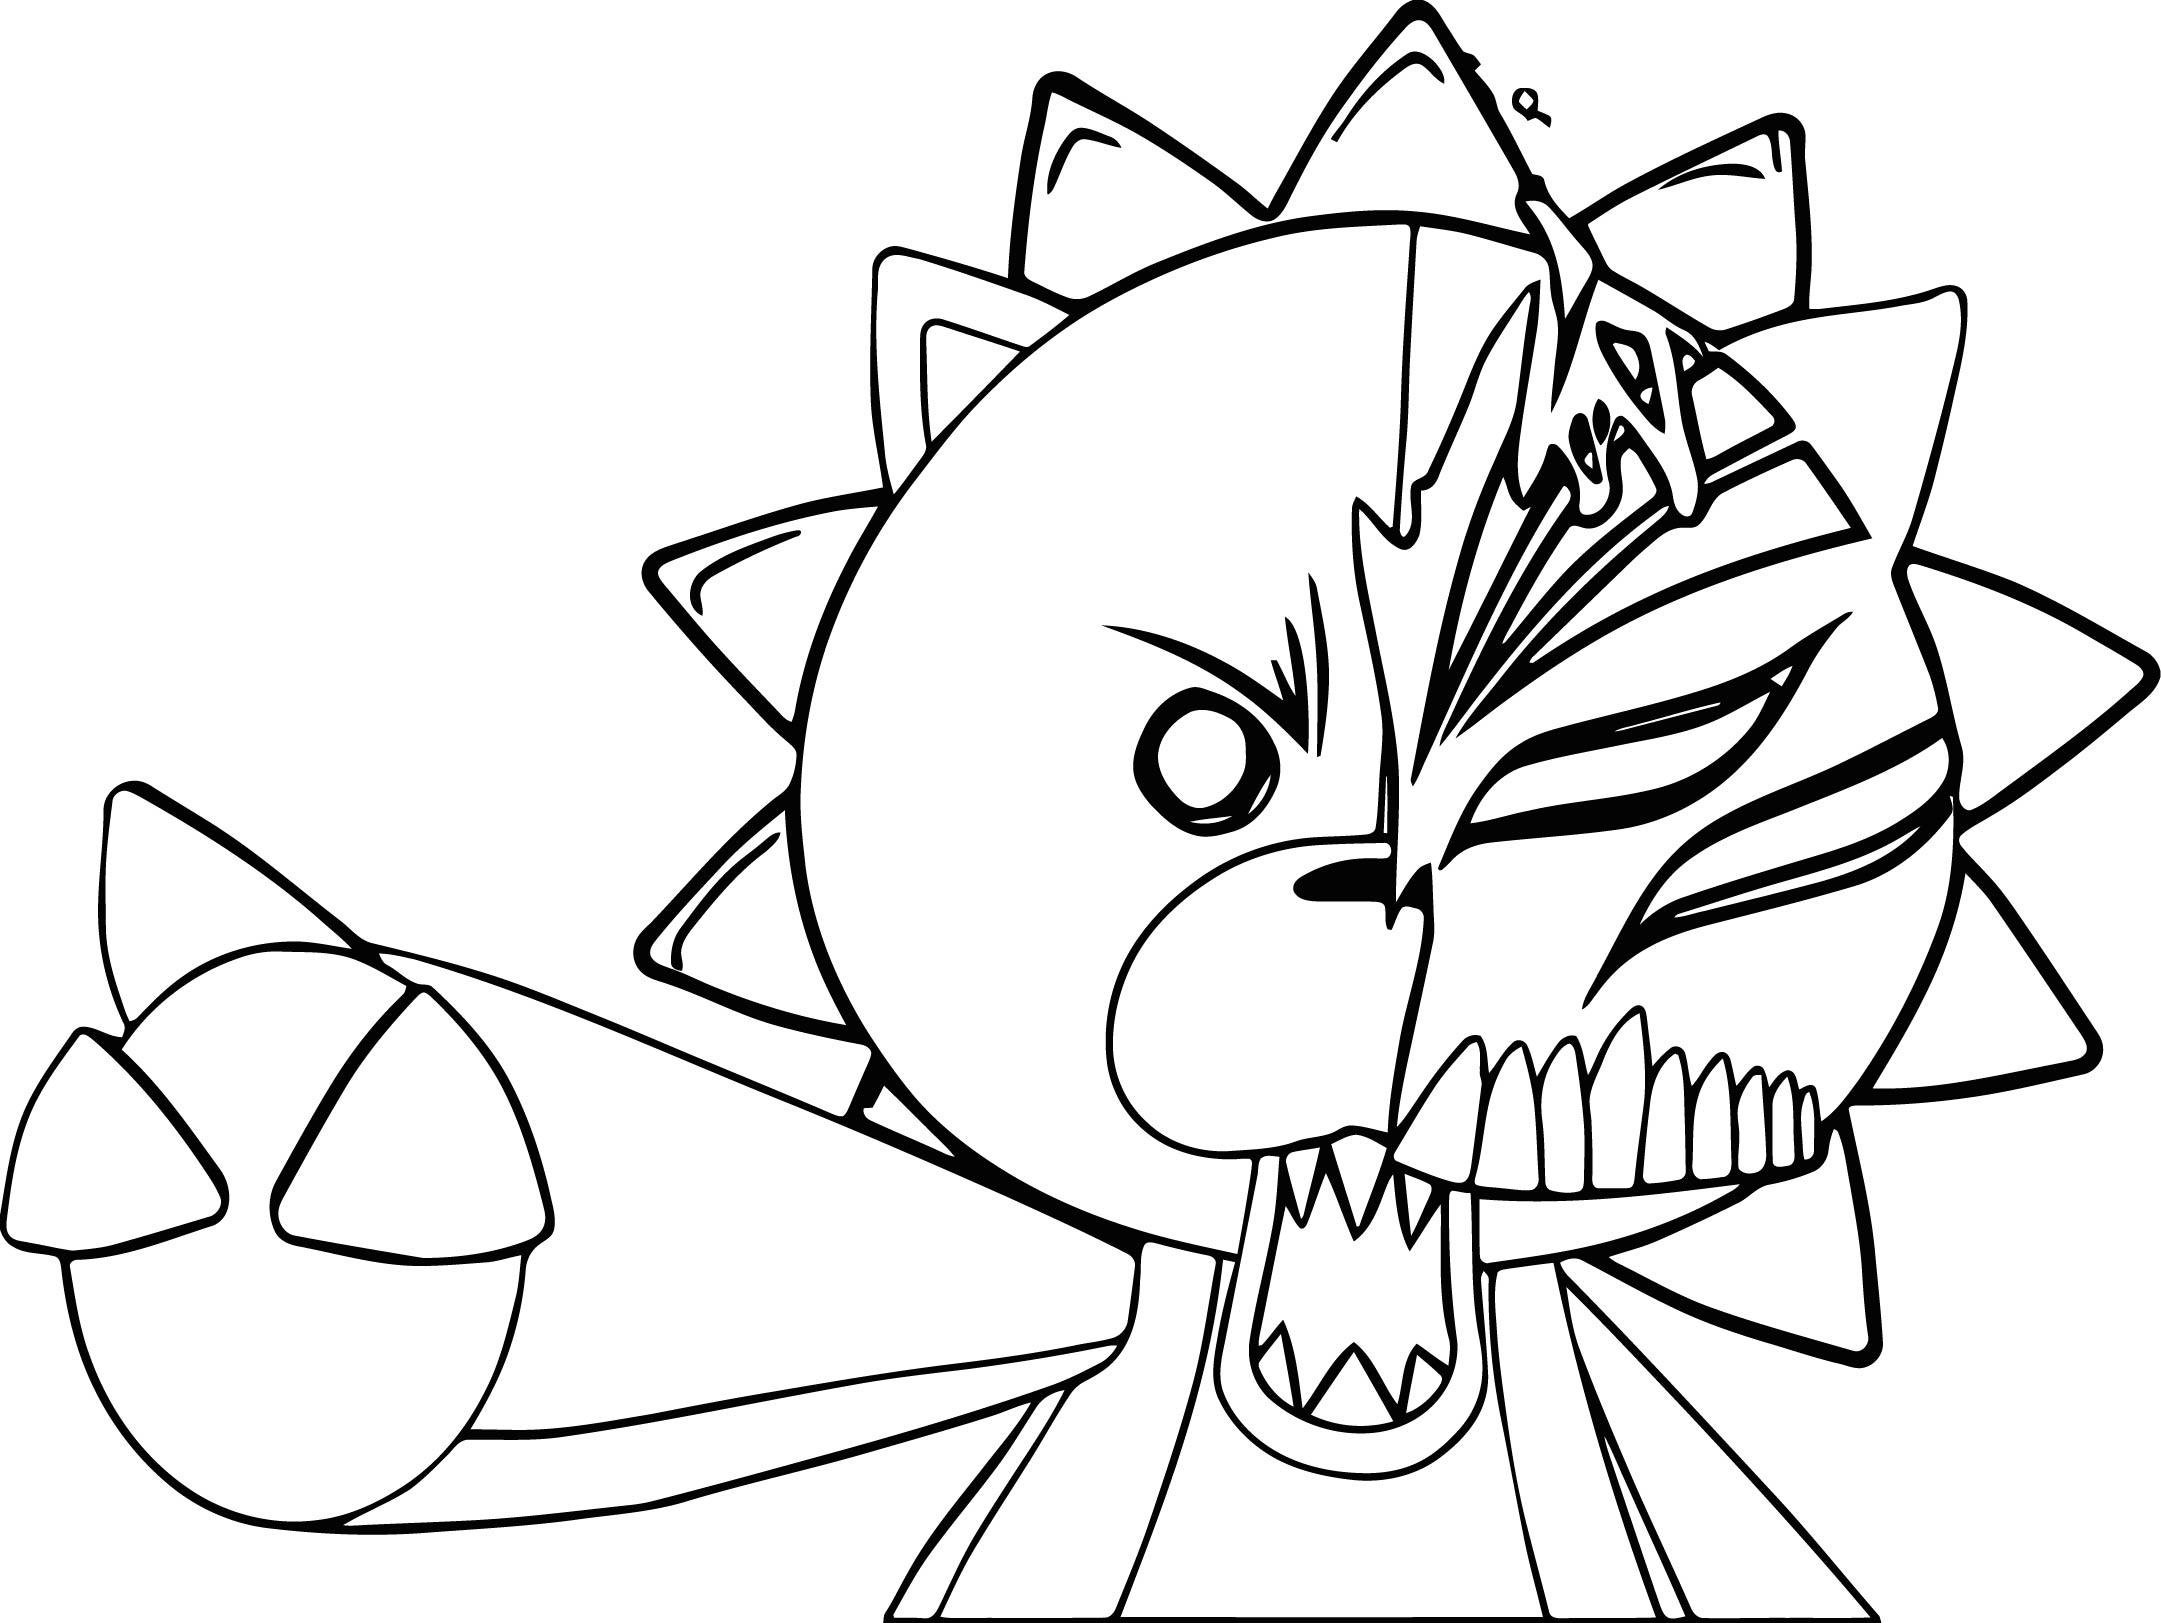 Manga Bear Coloring Page